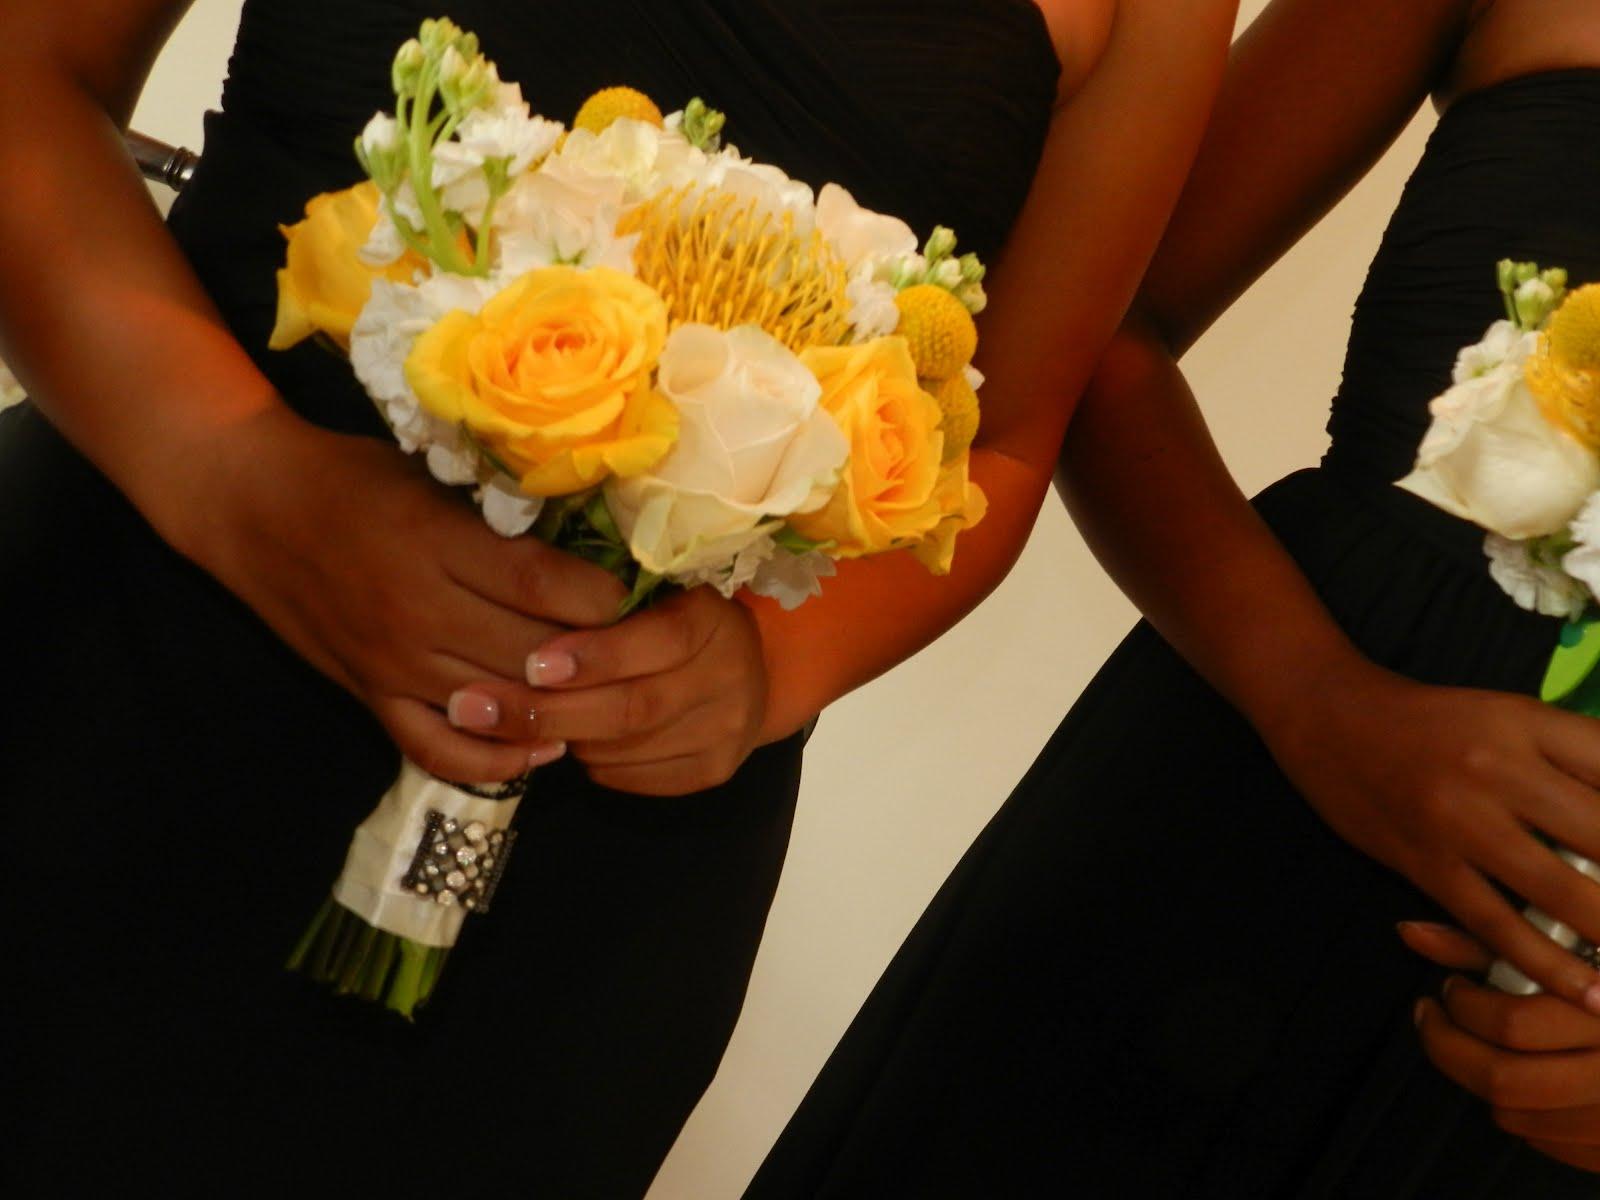 wedding planning classes atlanta wedding planner wedding flowers weddings atlanta bridal. Black Bedroom Furniture Sets. Home Design Ideas